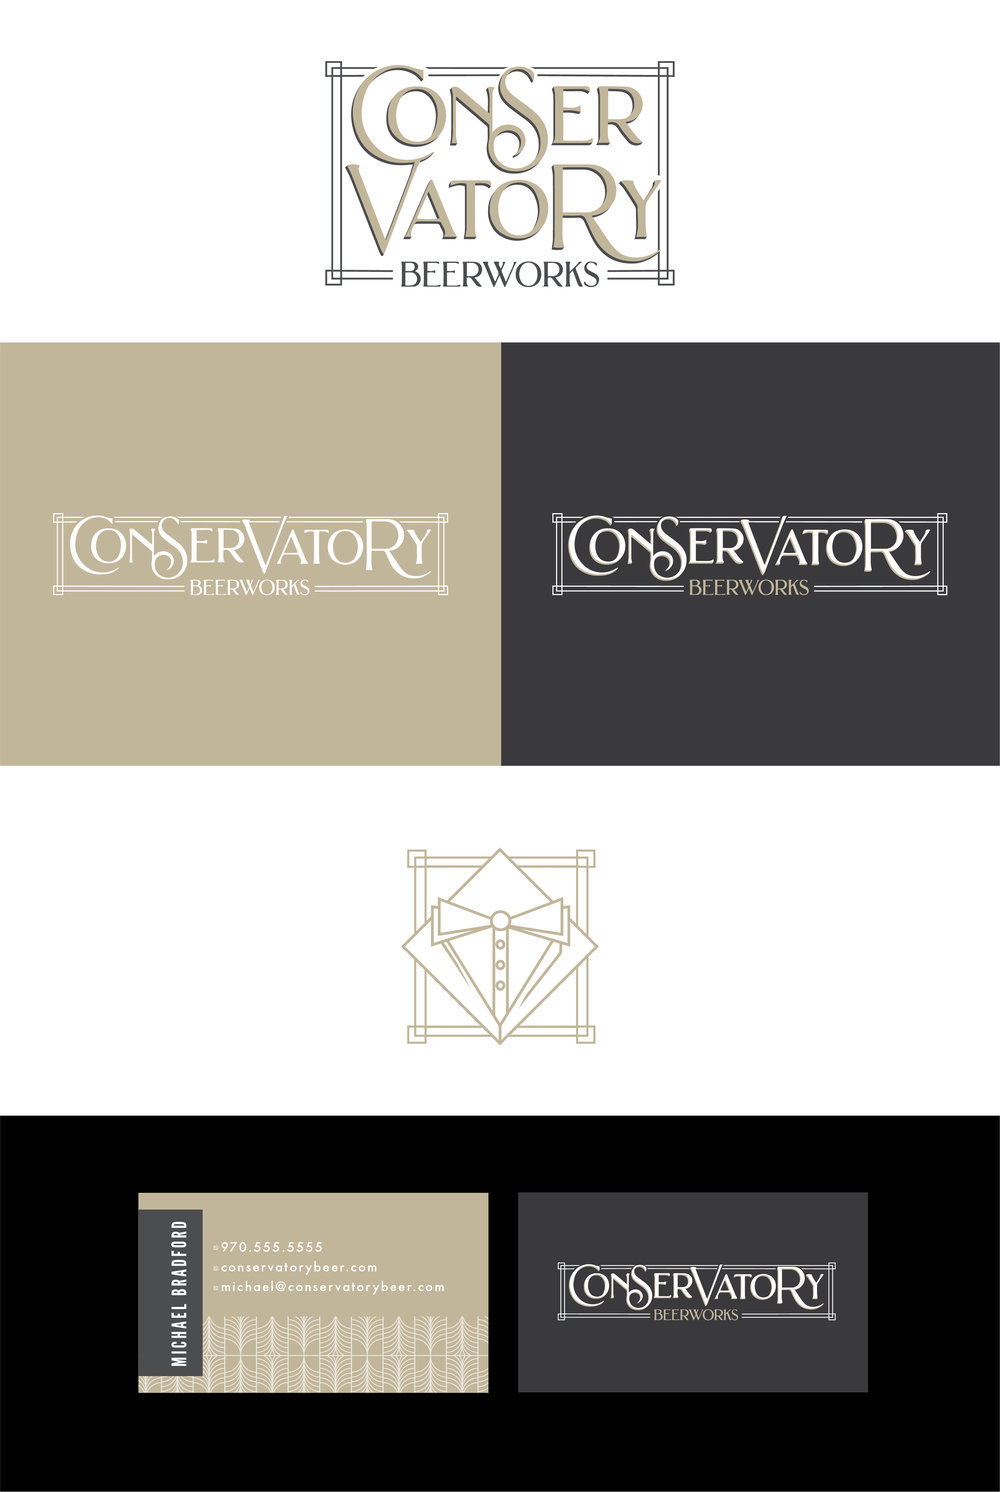 Conservatory_FirstLook-02.jpg